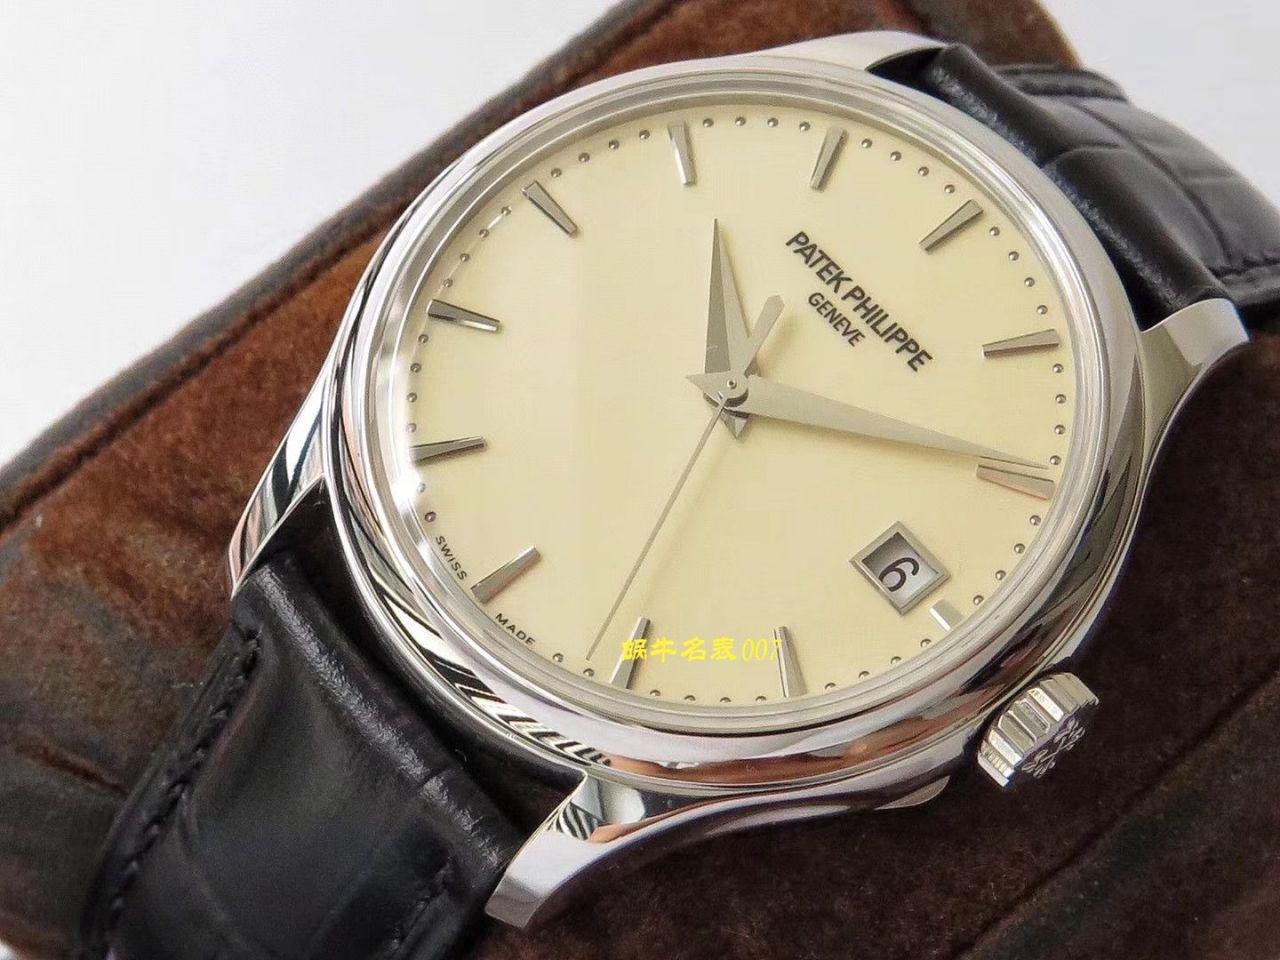 【ZF厂百达翡丽仿表多少钱】百达翡丽古典表系列5227G-001腕表